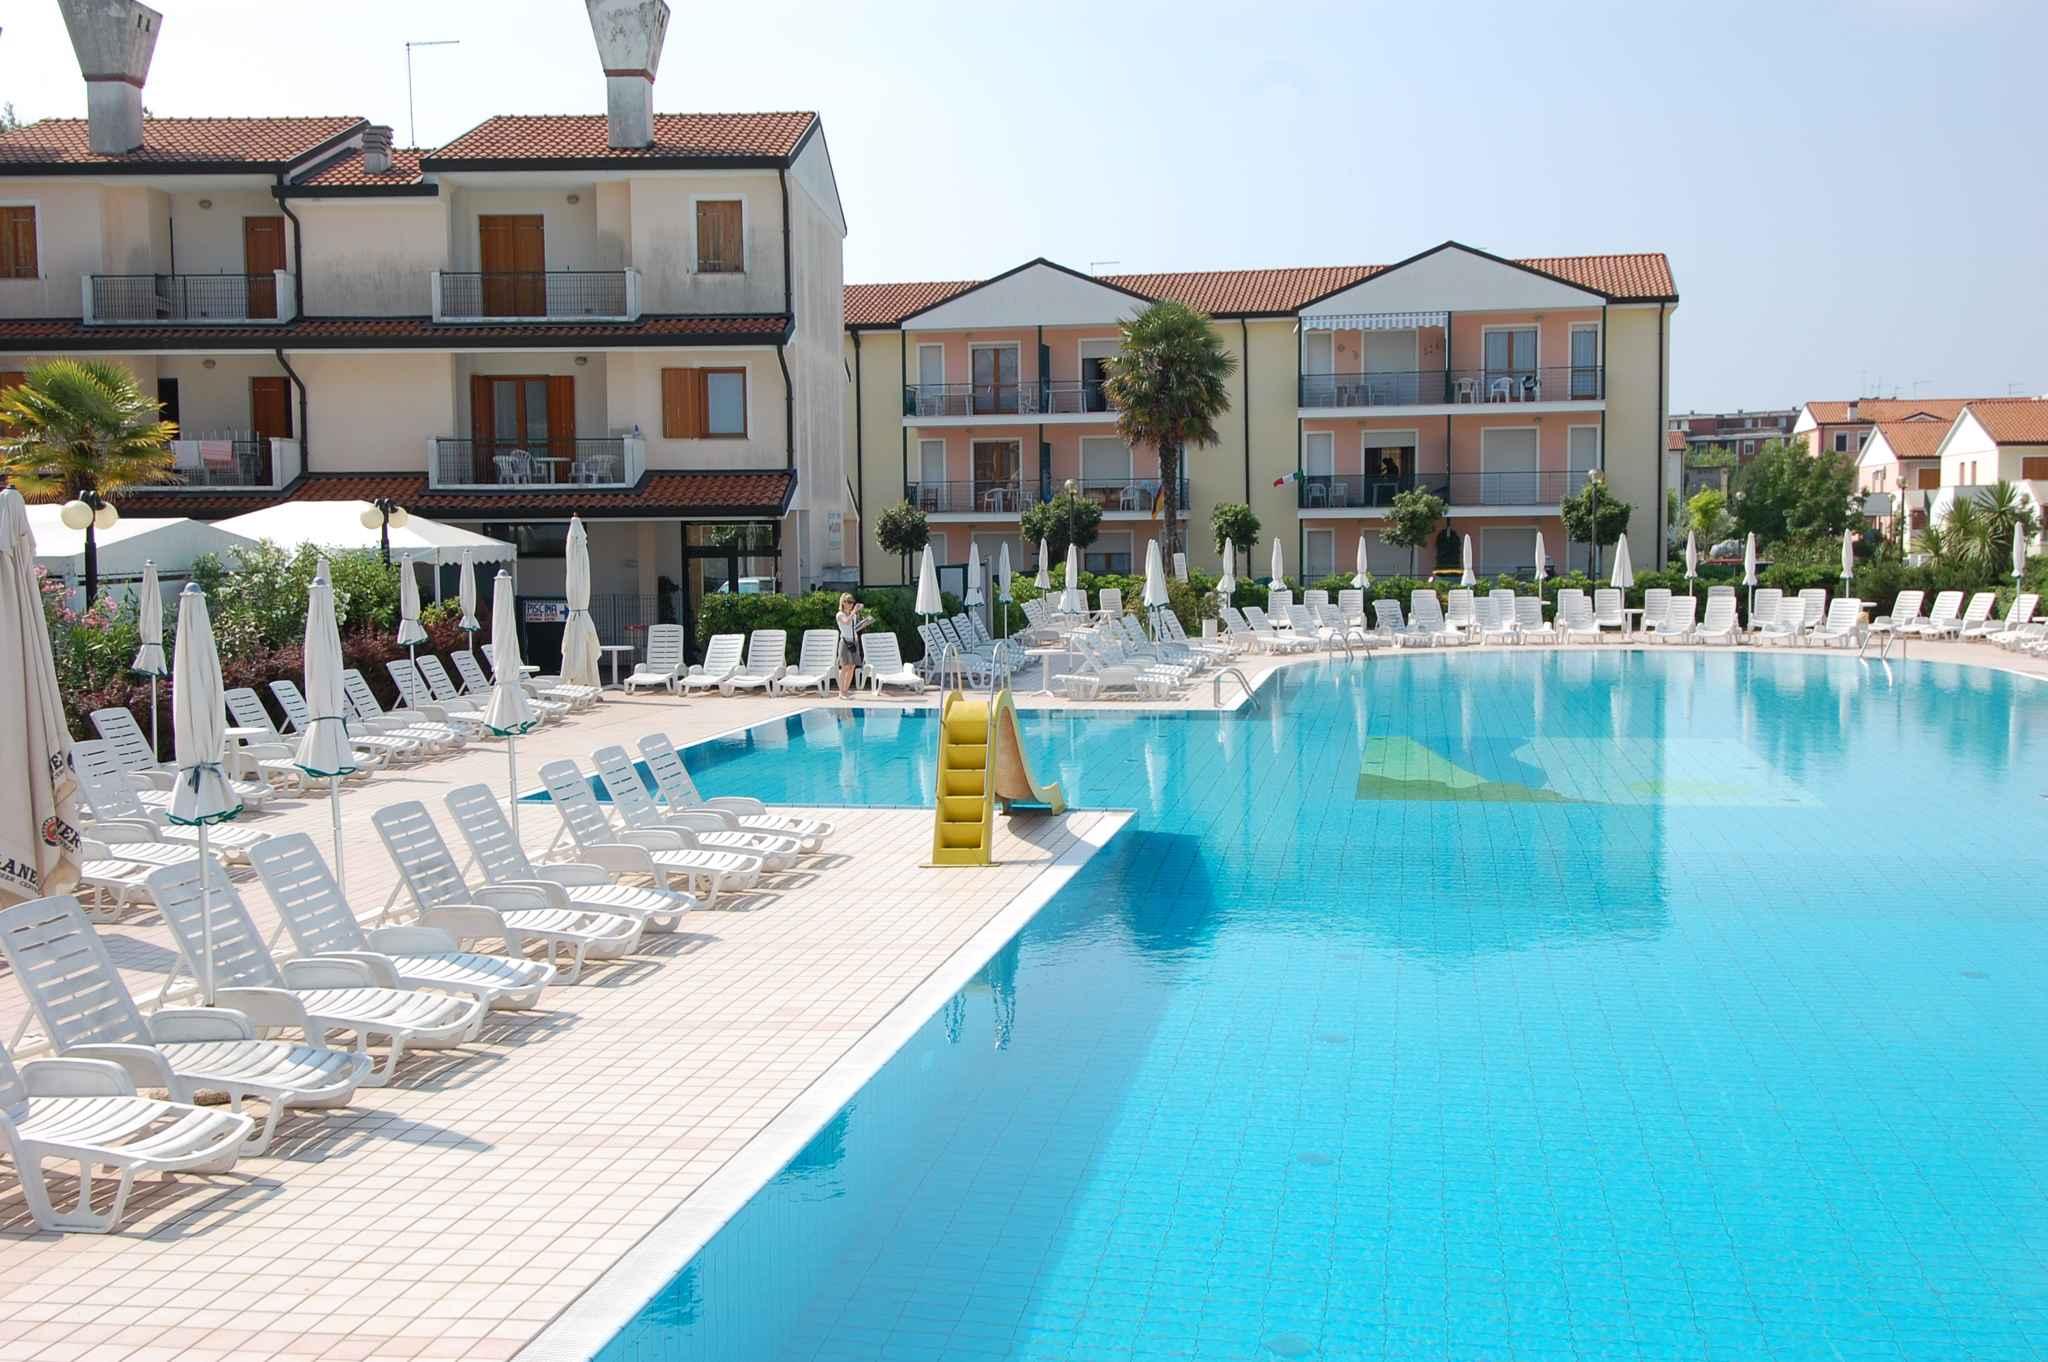 Ferienhaus mit Pool und Grill (284304), Rosolina Mare, Rovigo, Venetien, Italien, Bild 9